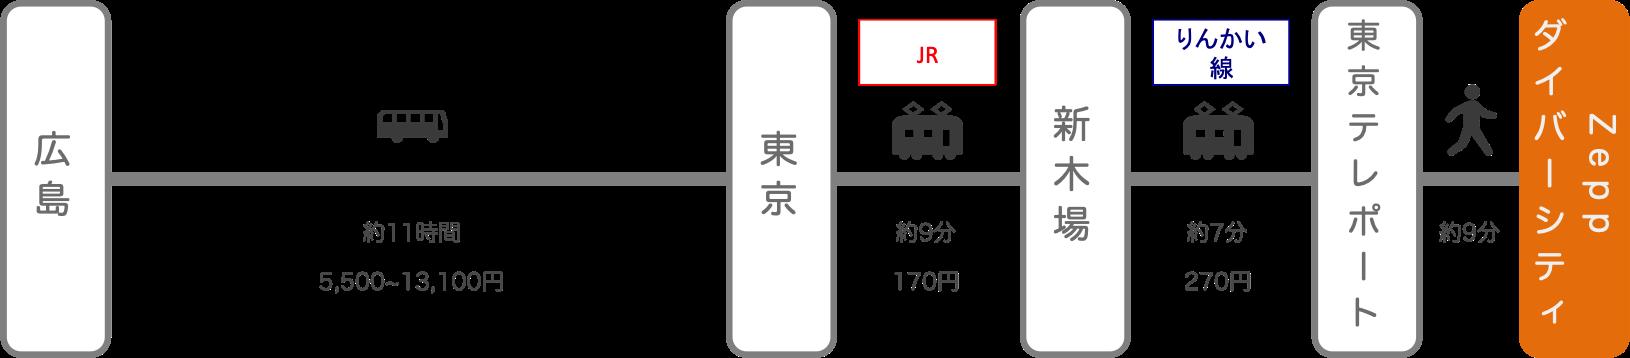 Zeppダイバーシティ_広島_高速バス